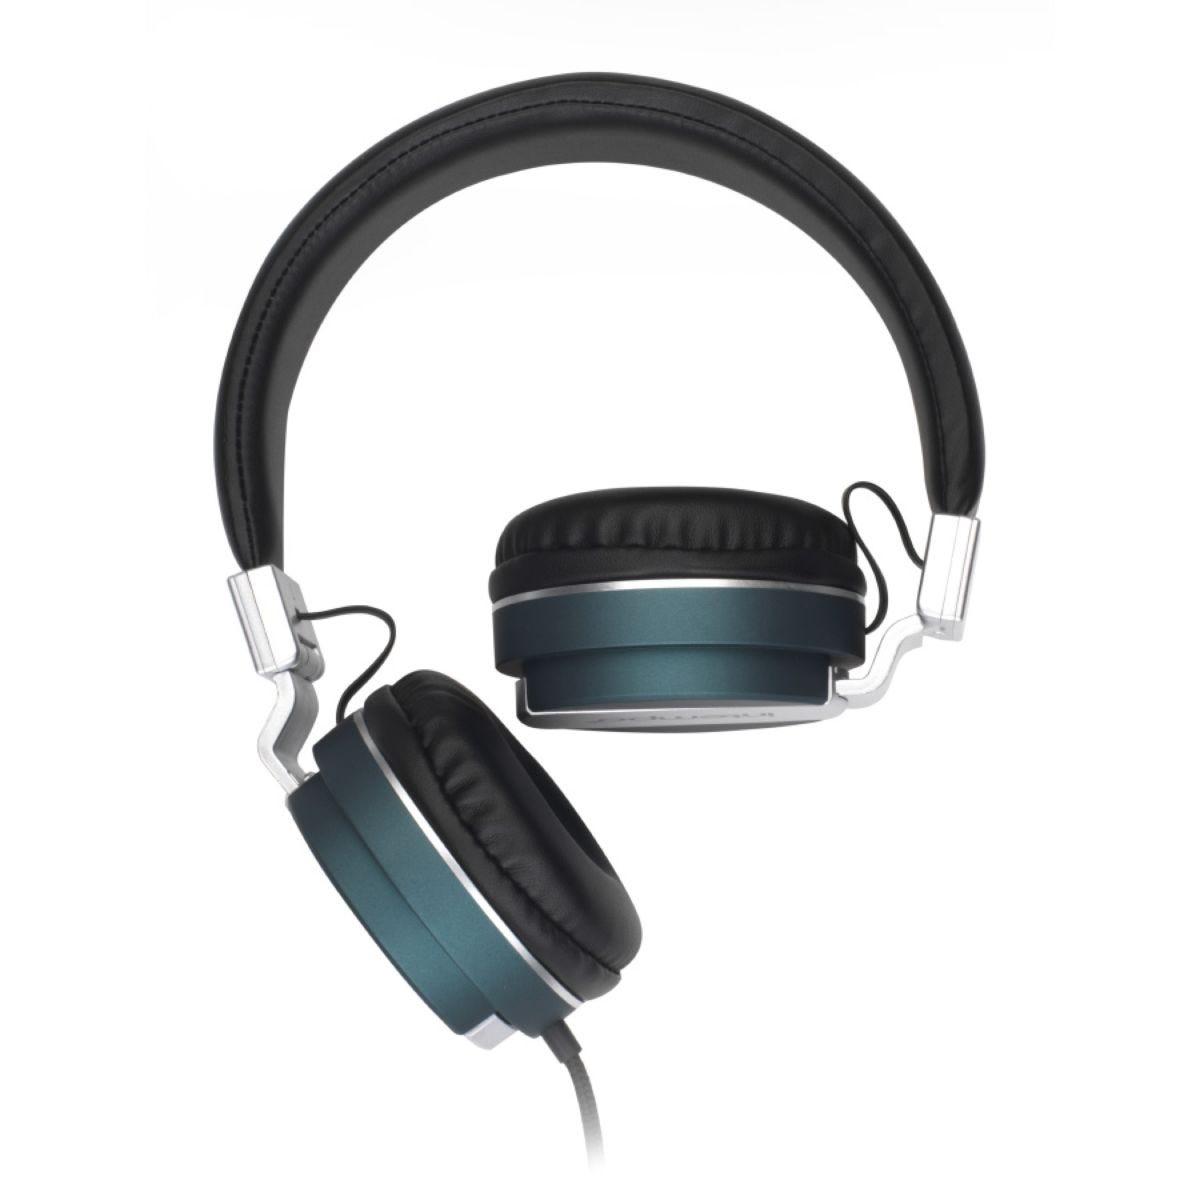 Intempo Revive Headphones - Teal